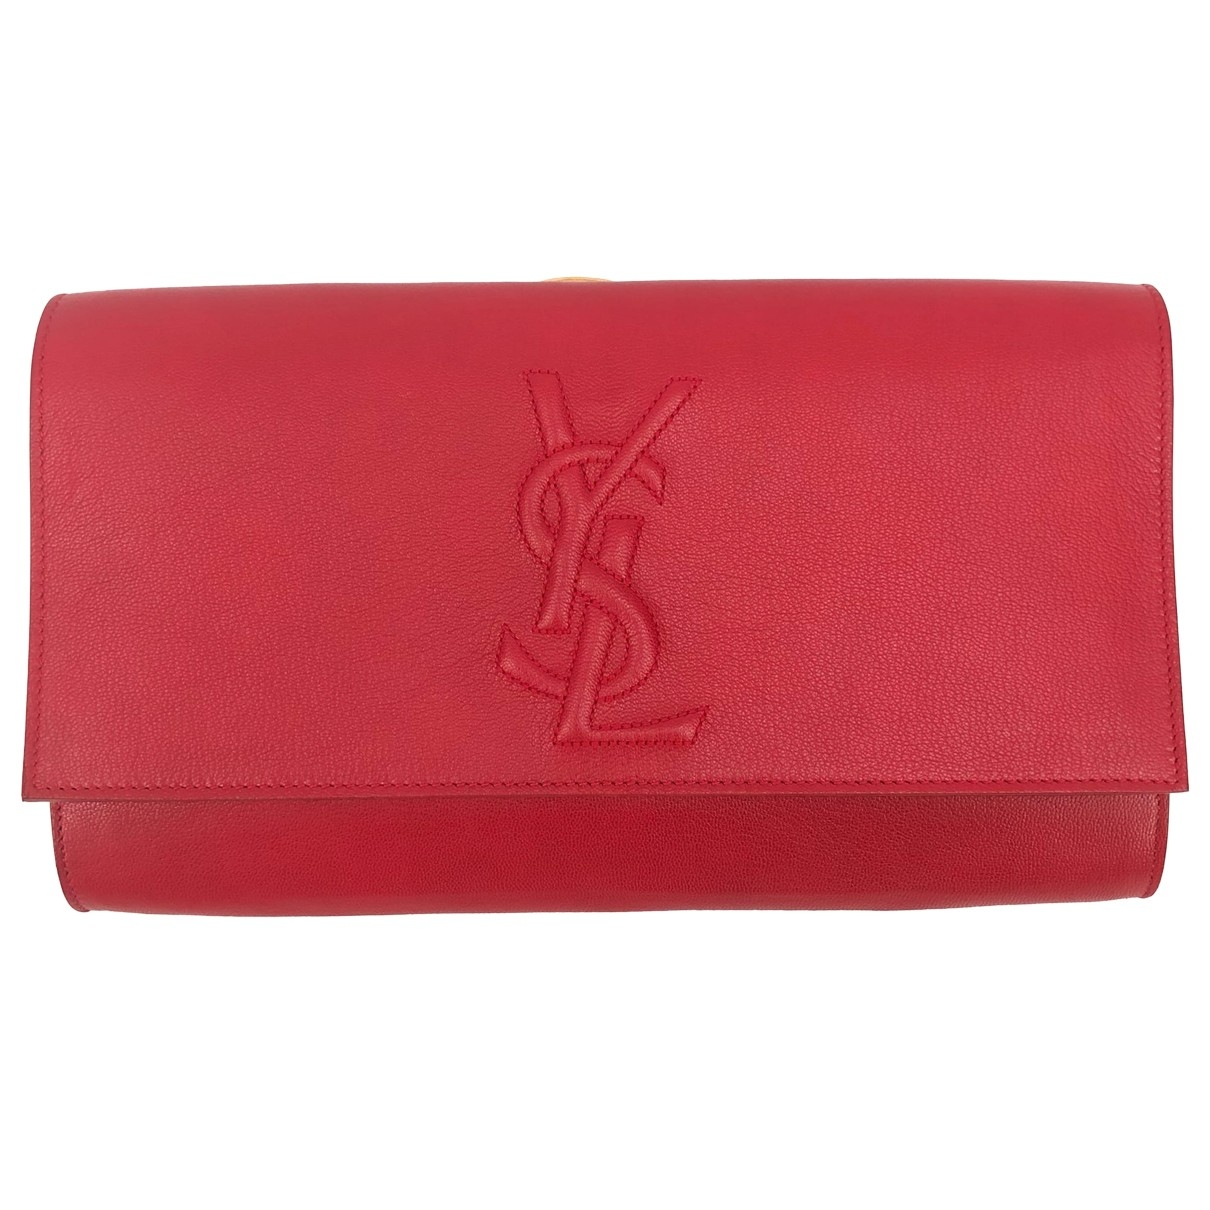 Yves Saint Laurent Belle de Jour Red Leather Clutch bag for Women \N